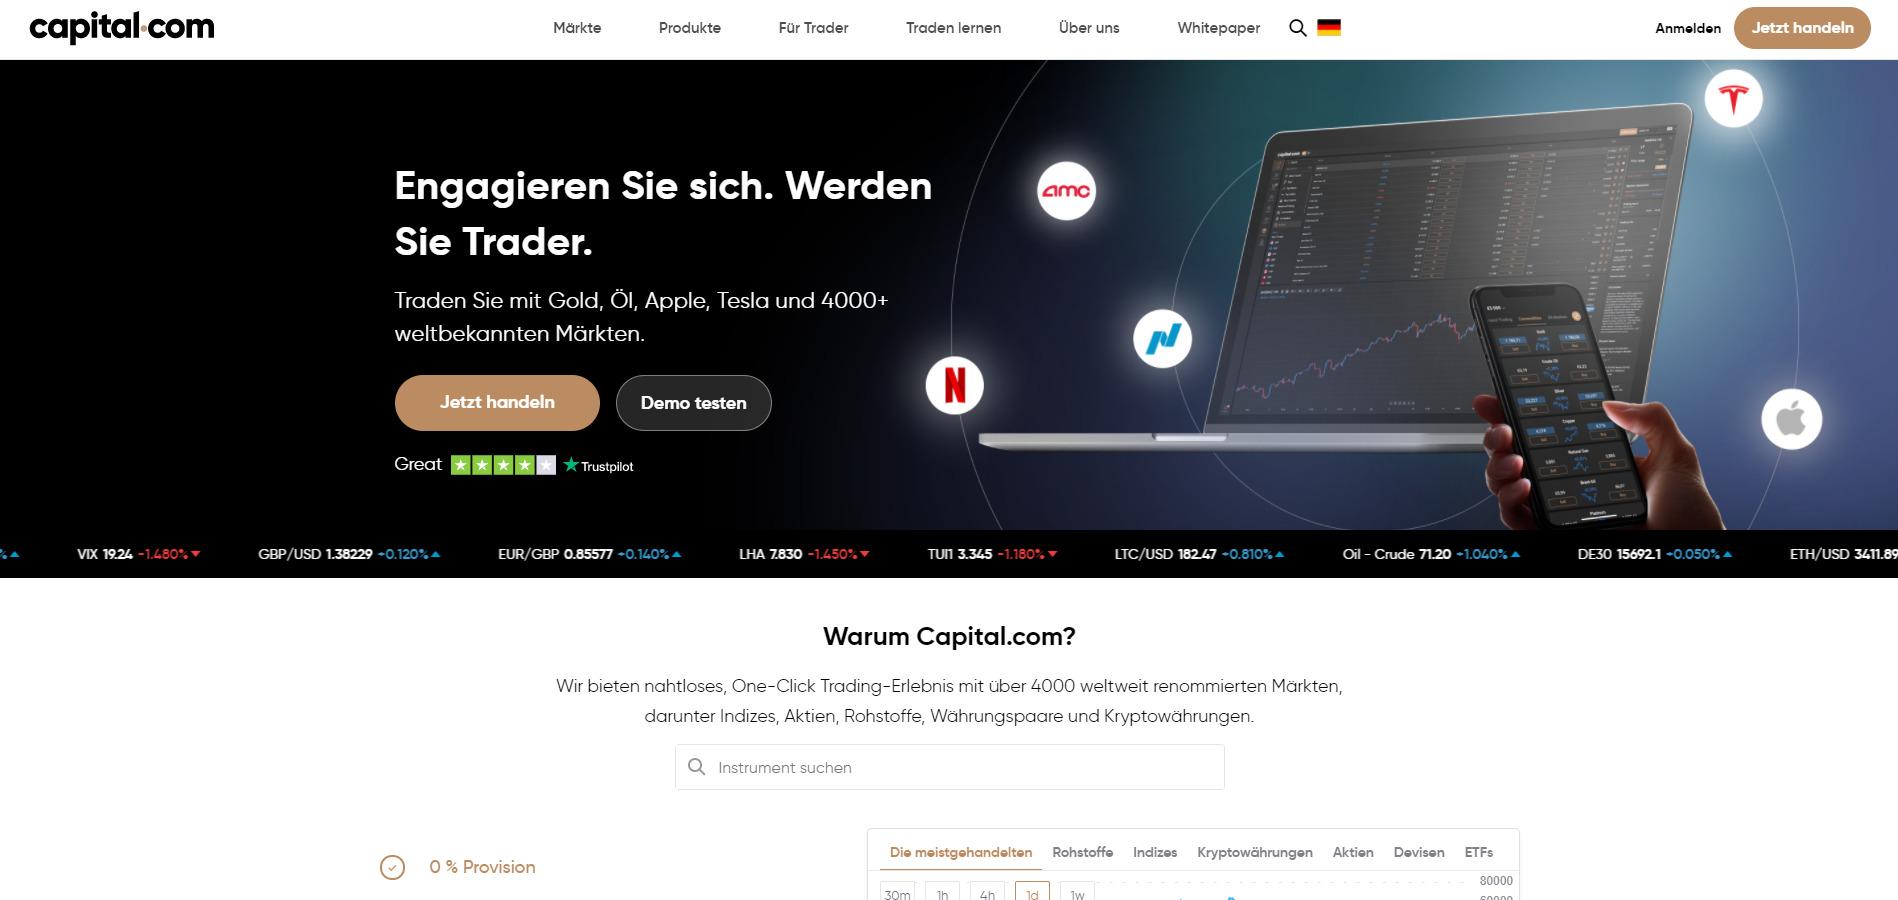 Capital.com offizielle Webseite